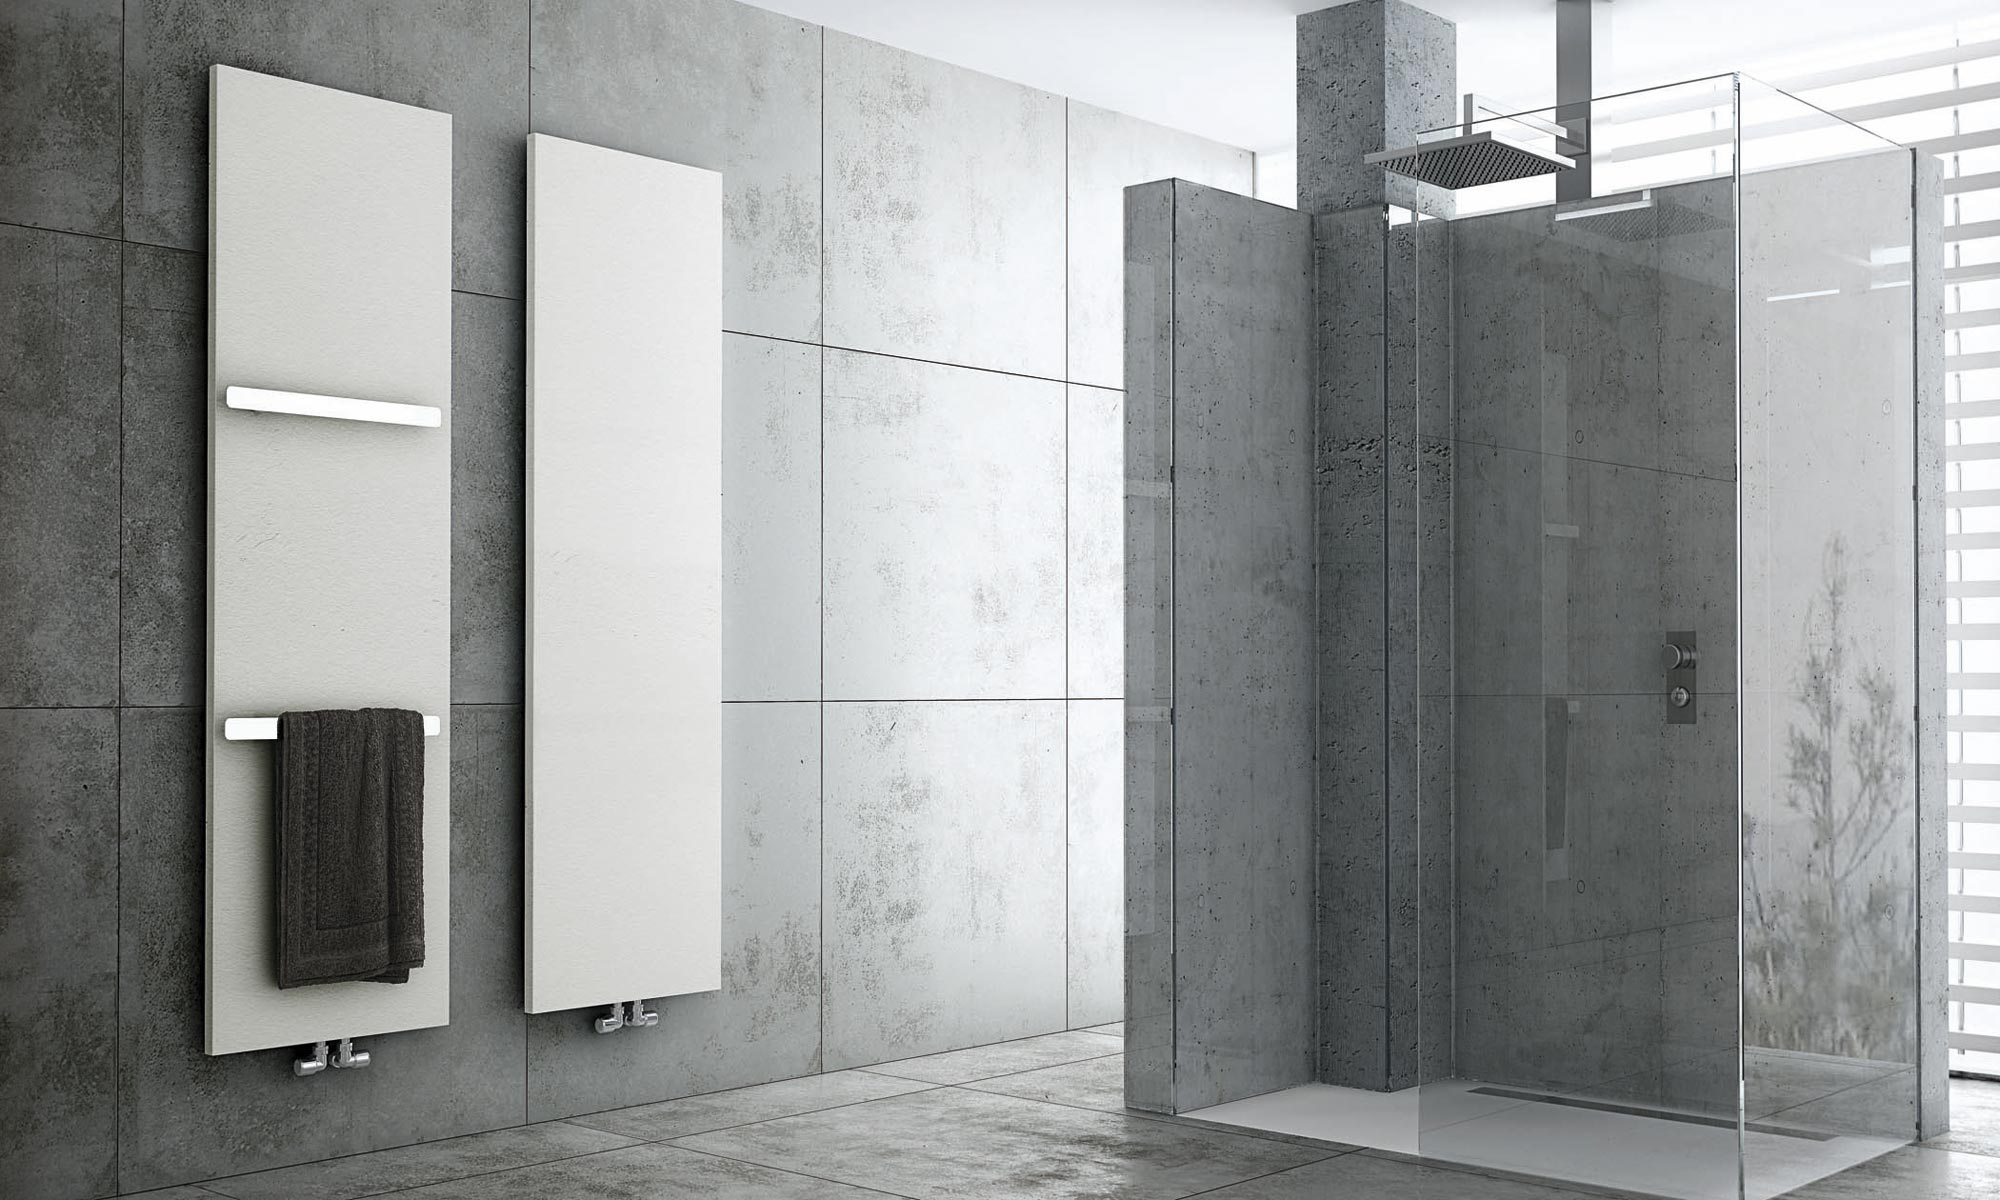 Badheizk rper und handtuchtrockner design endet nie - Radiator badezimmer ...